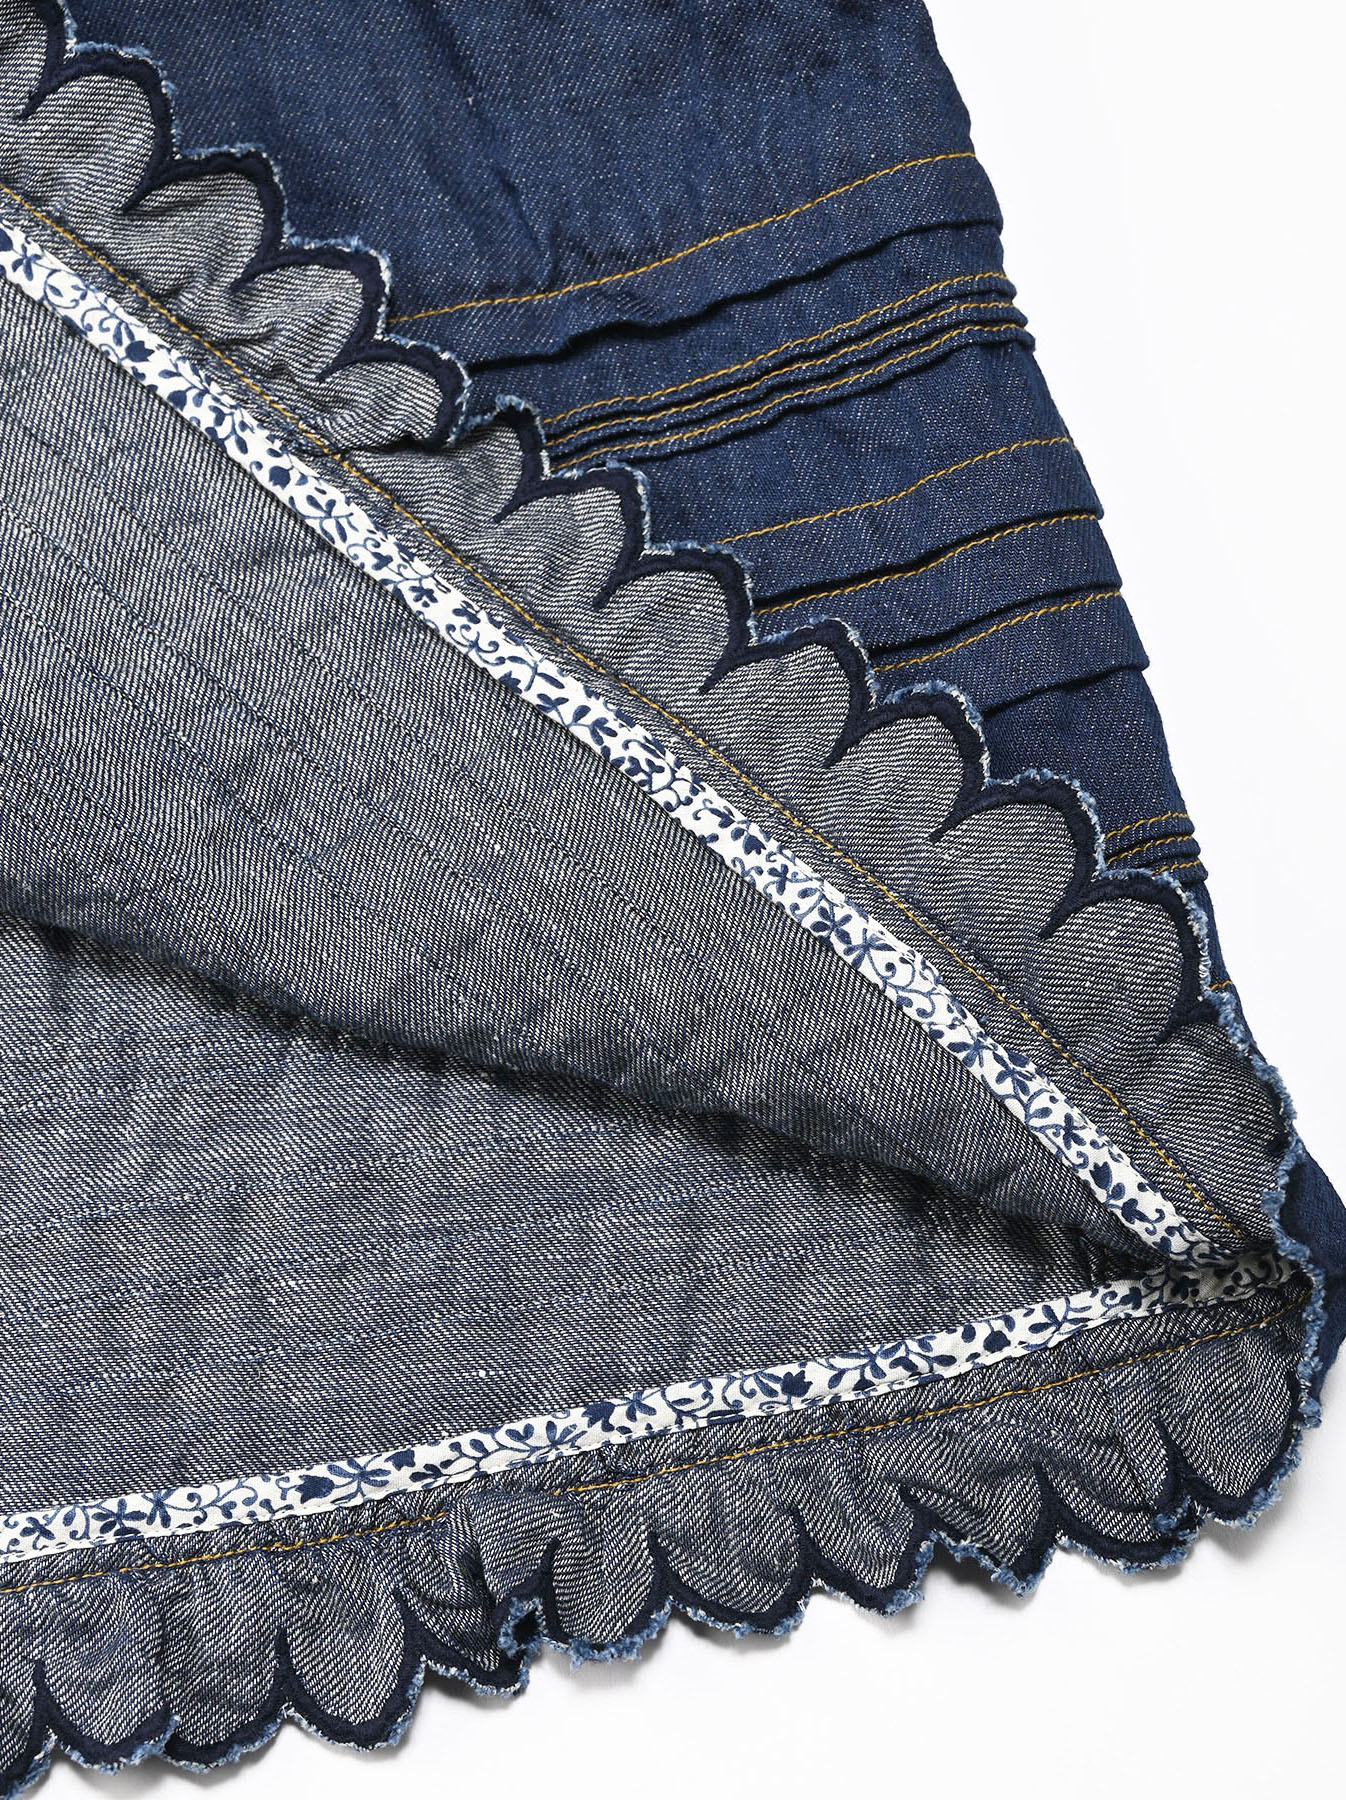 Komugi Denim Tuck Lace Dress-11